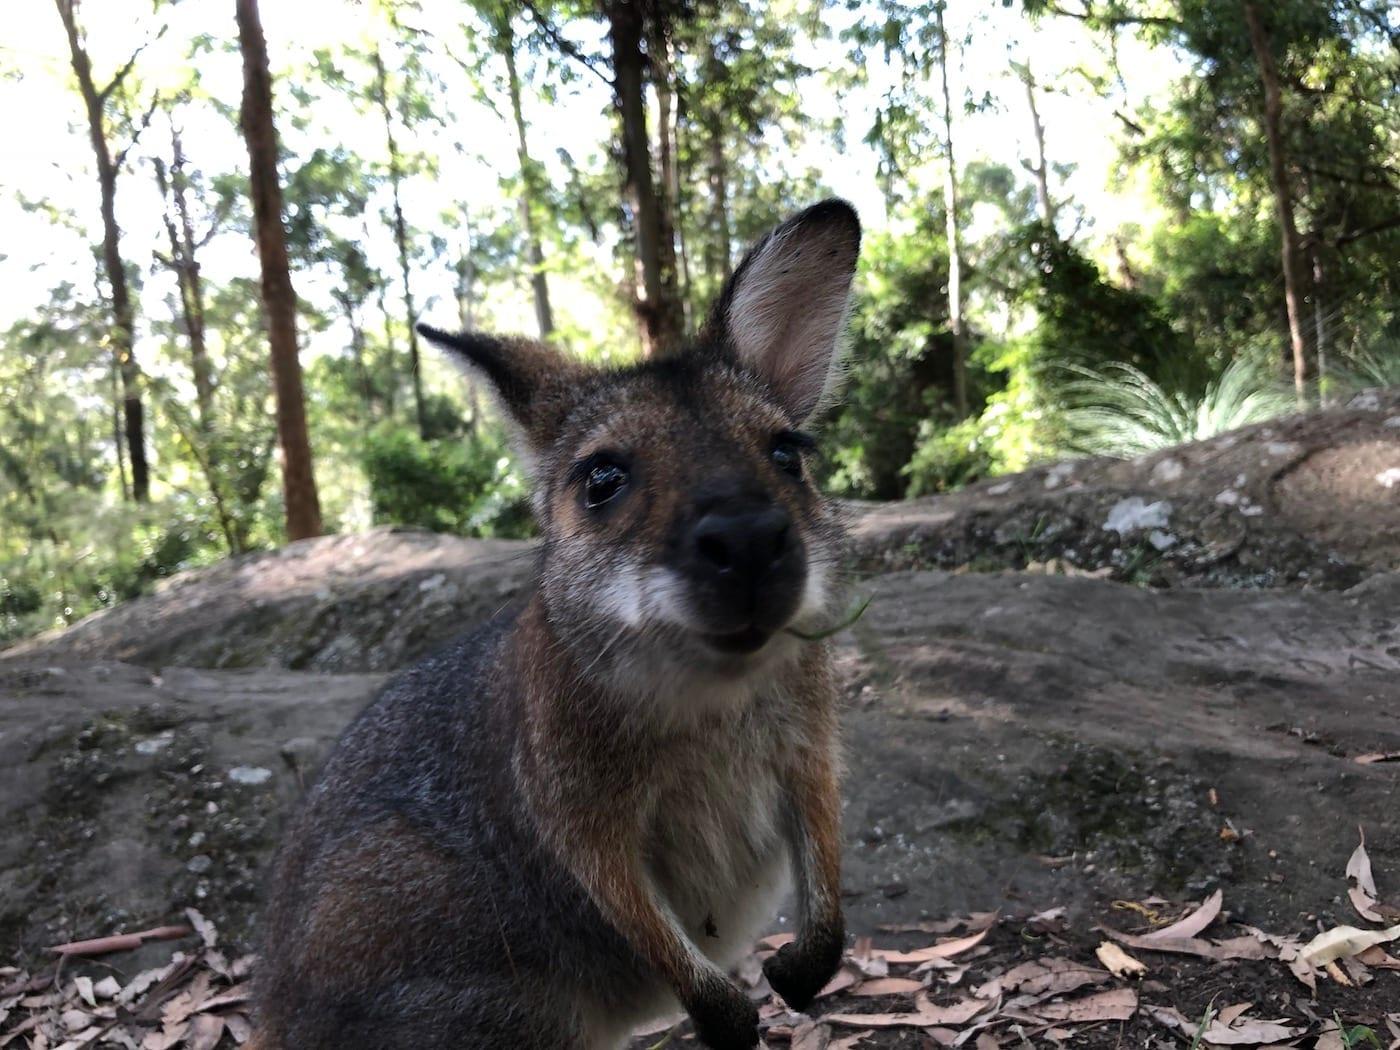 Wallaby checking out the camera. Gap Creek Campground, Watagans National Park.